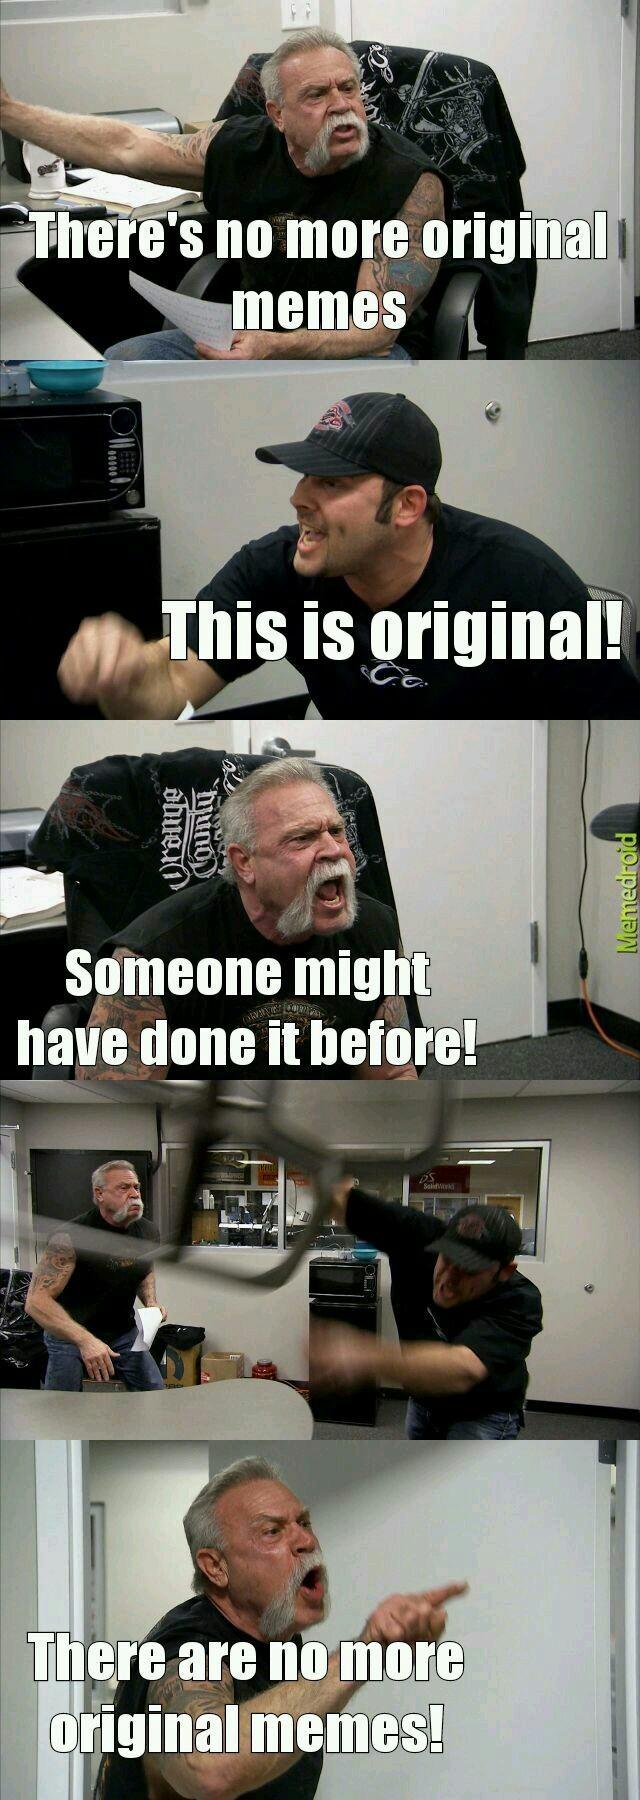 Downvote - meme